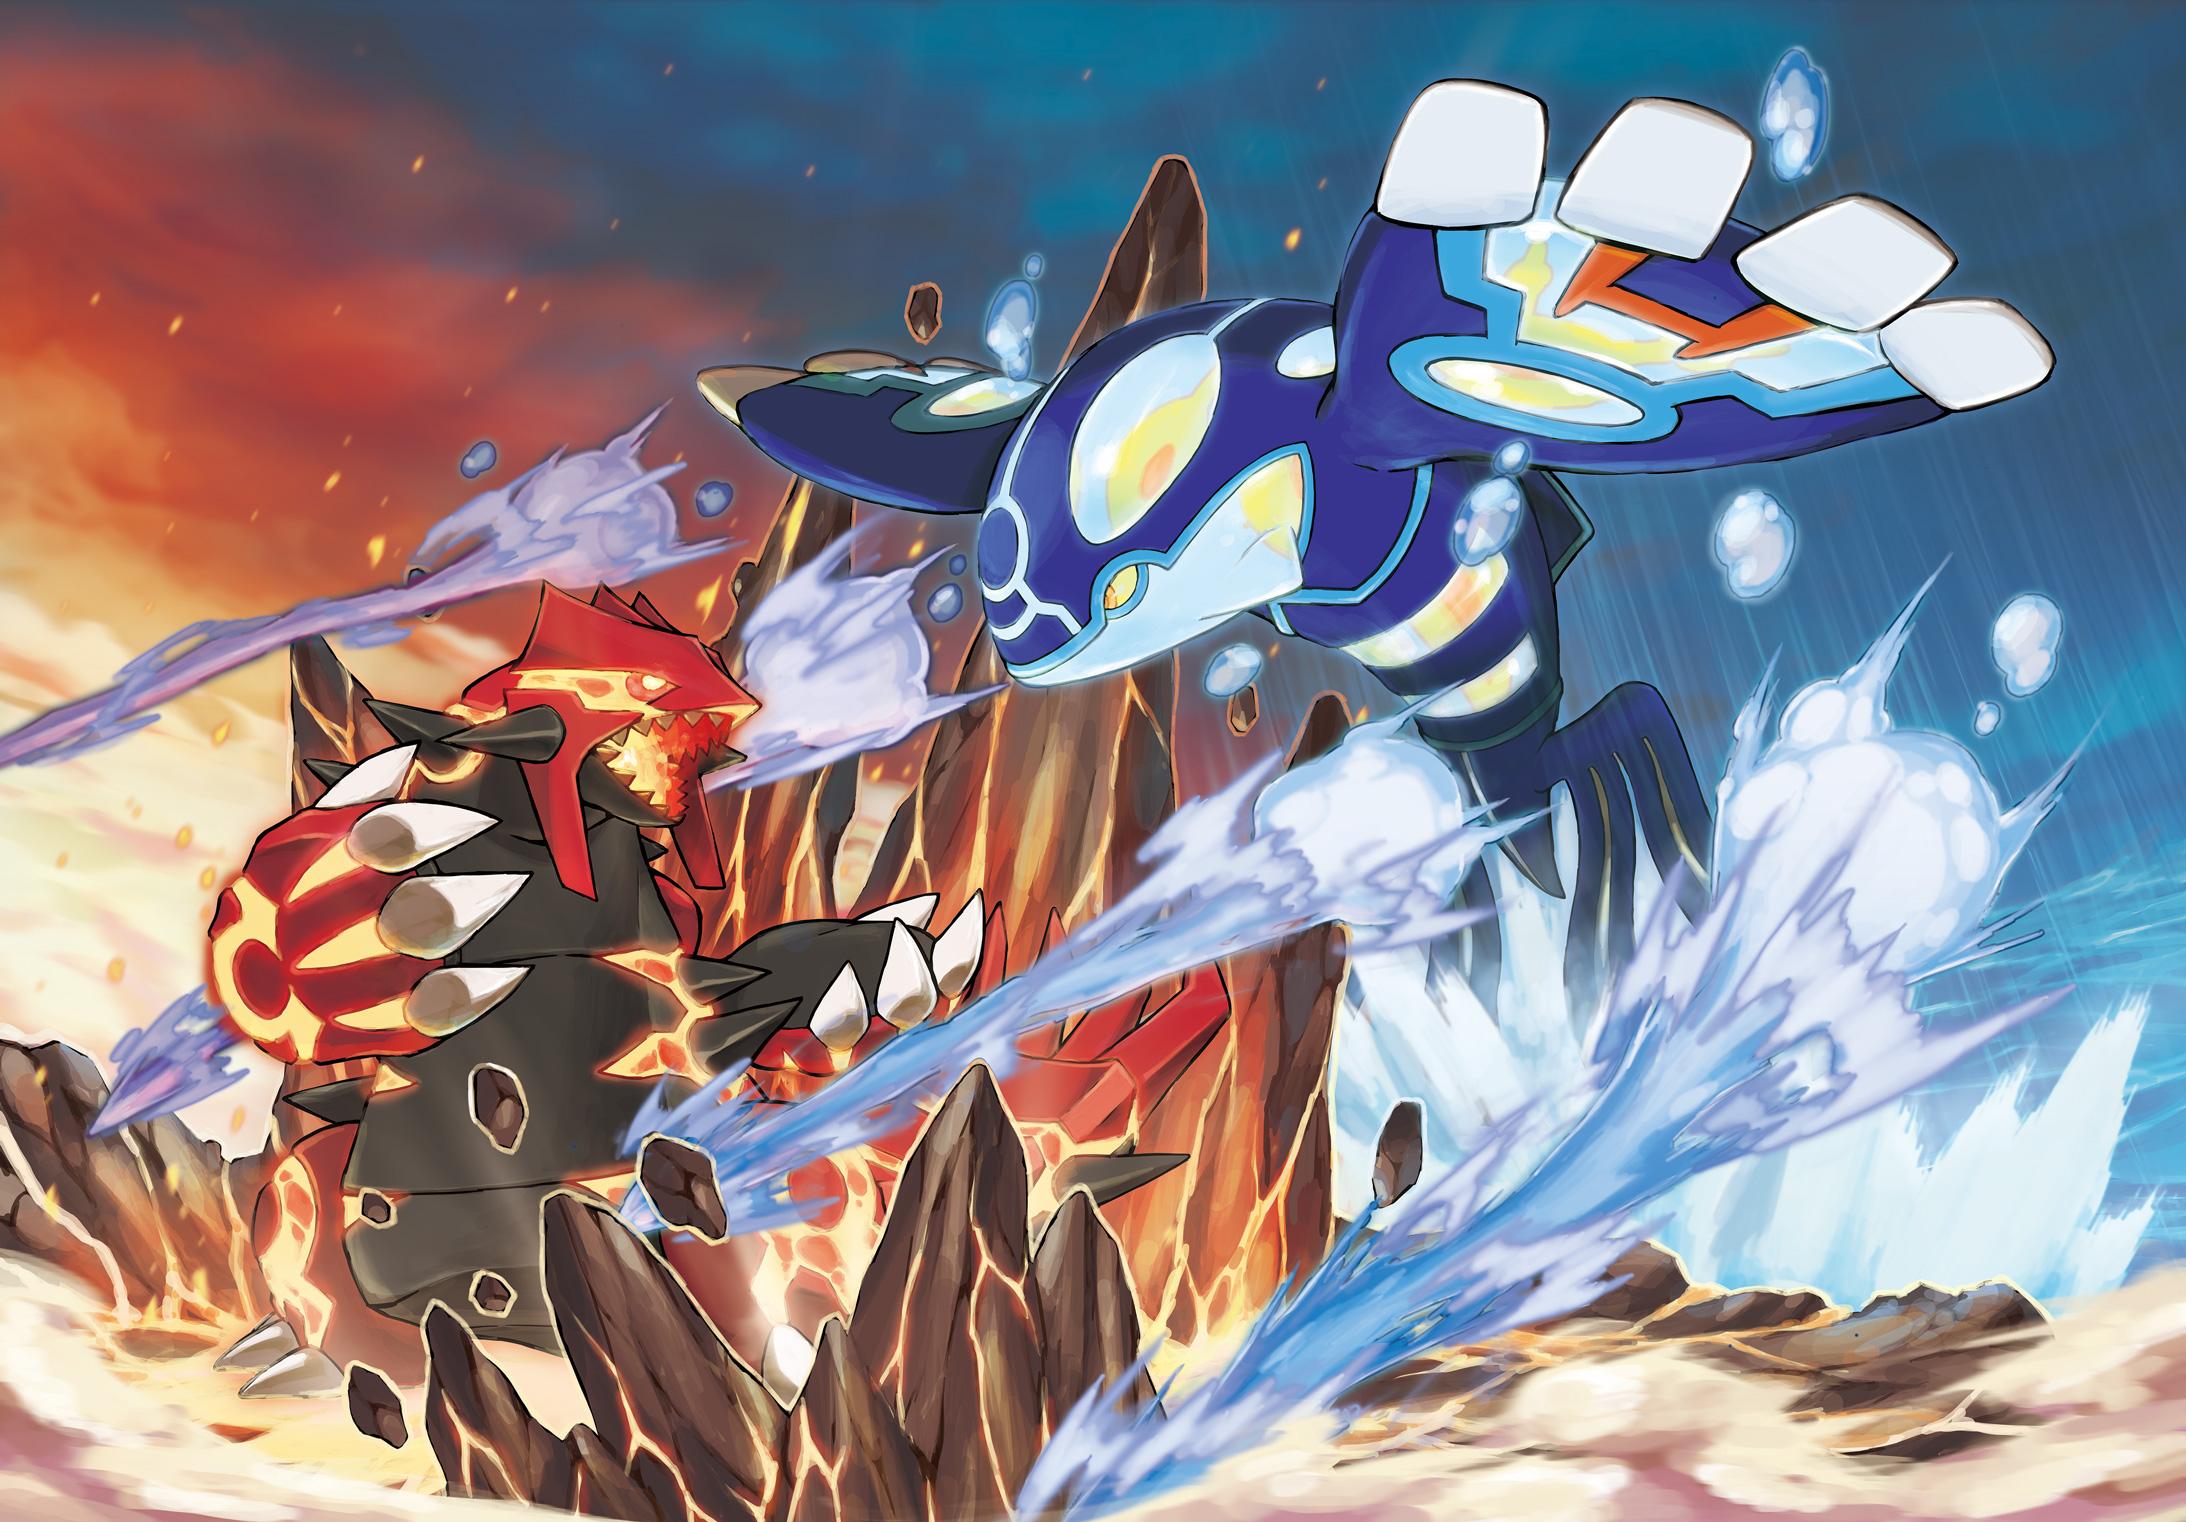 Pokémon Omega Ruby and Pokémon Alpha Sapphire